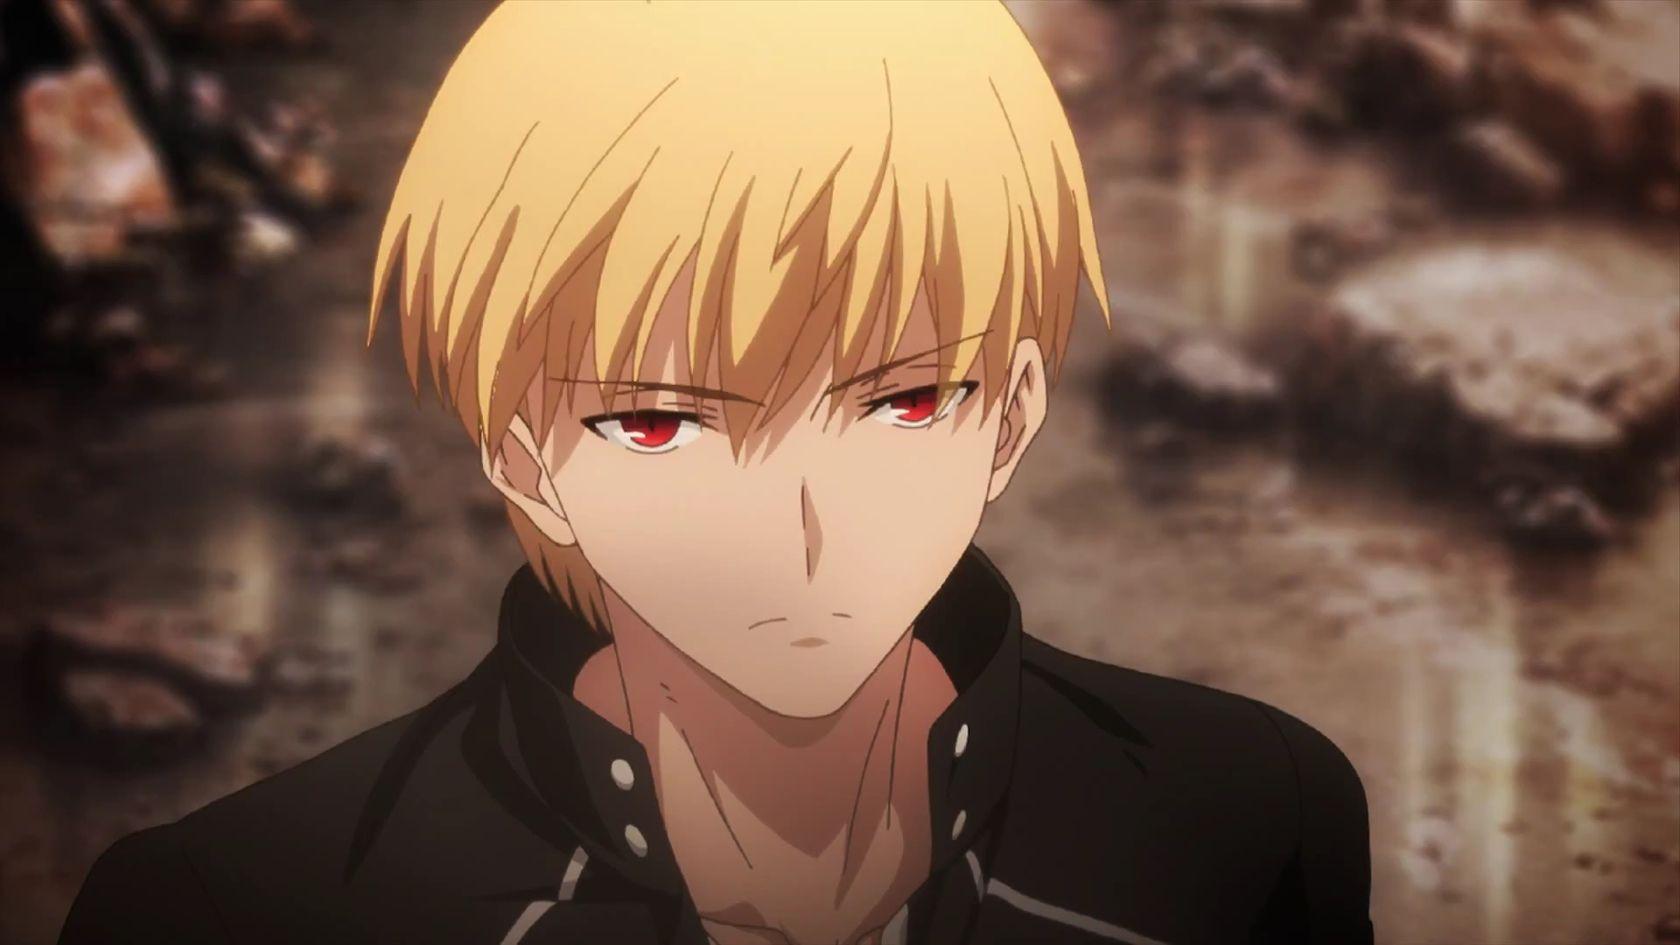 Pin by K♥ on GILGAMESH Gilgamesh fate, Anime heaven